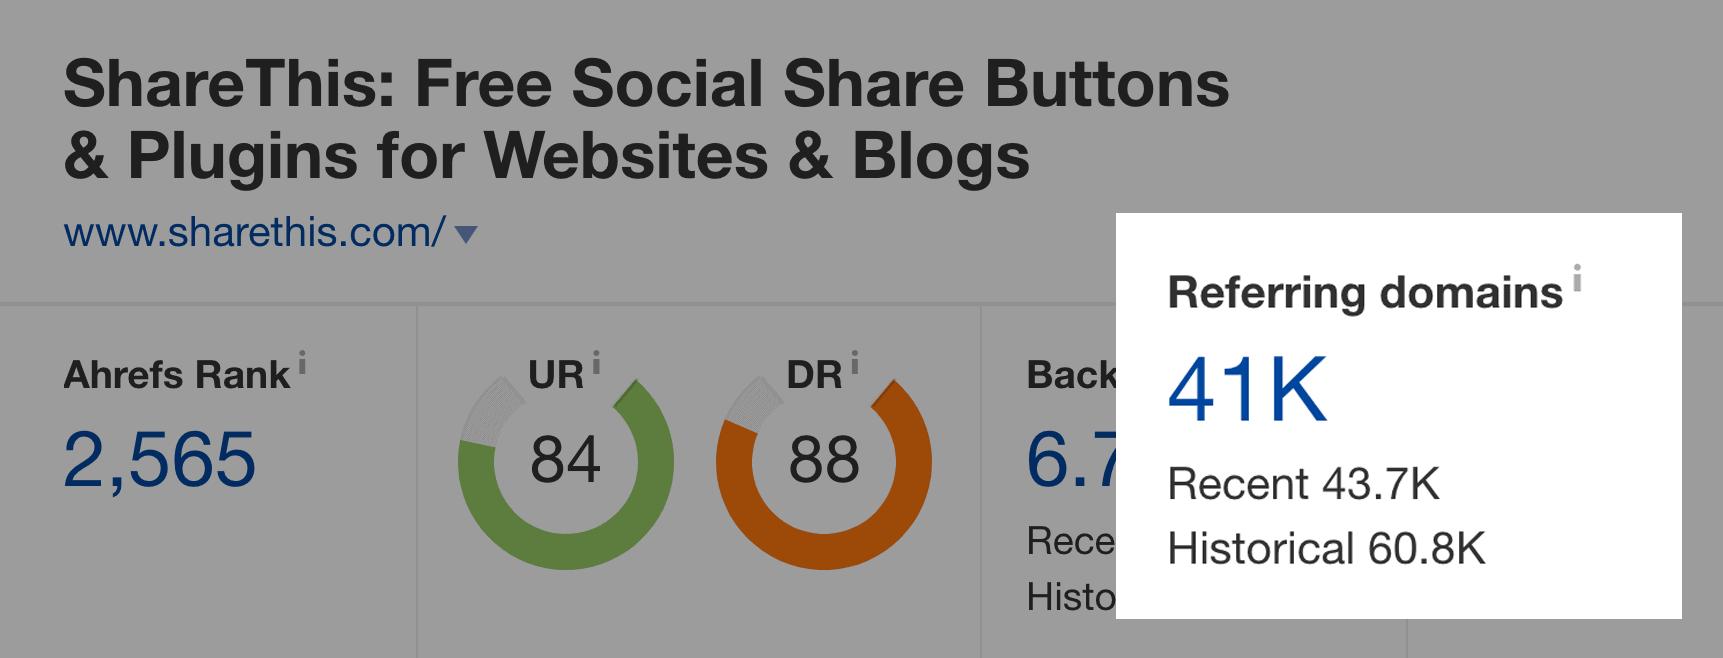 ShareThis – Referring domains